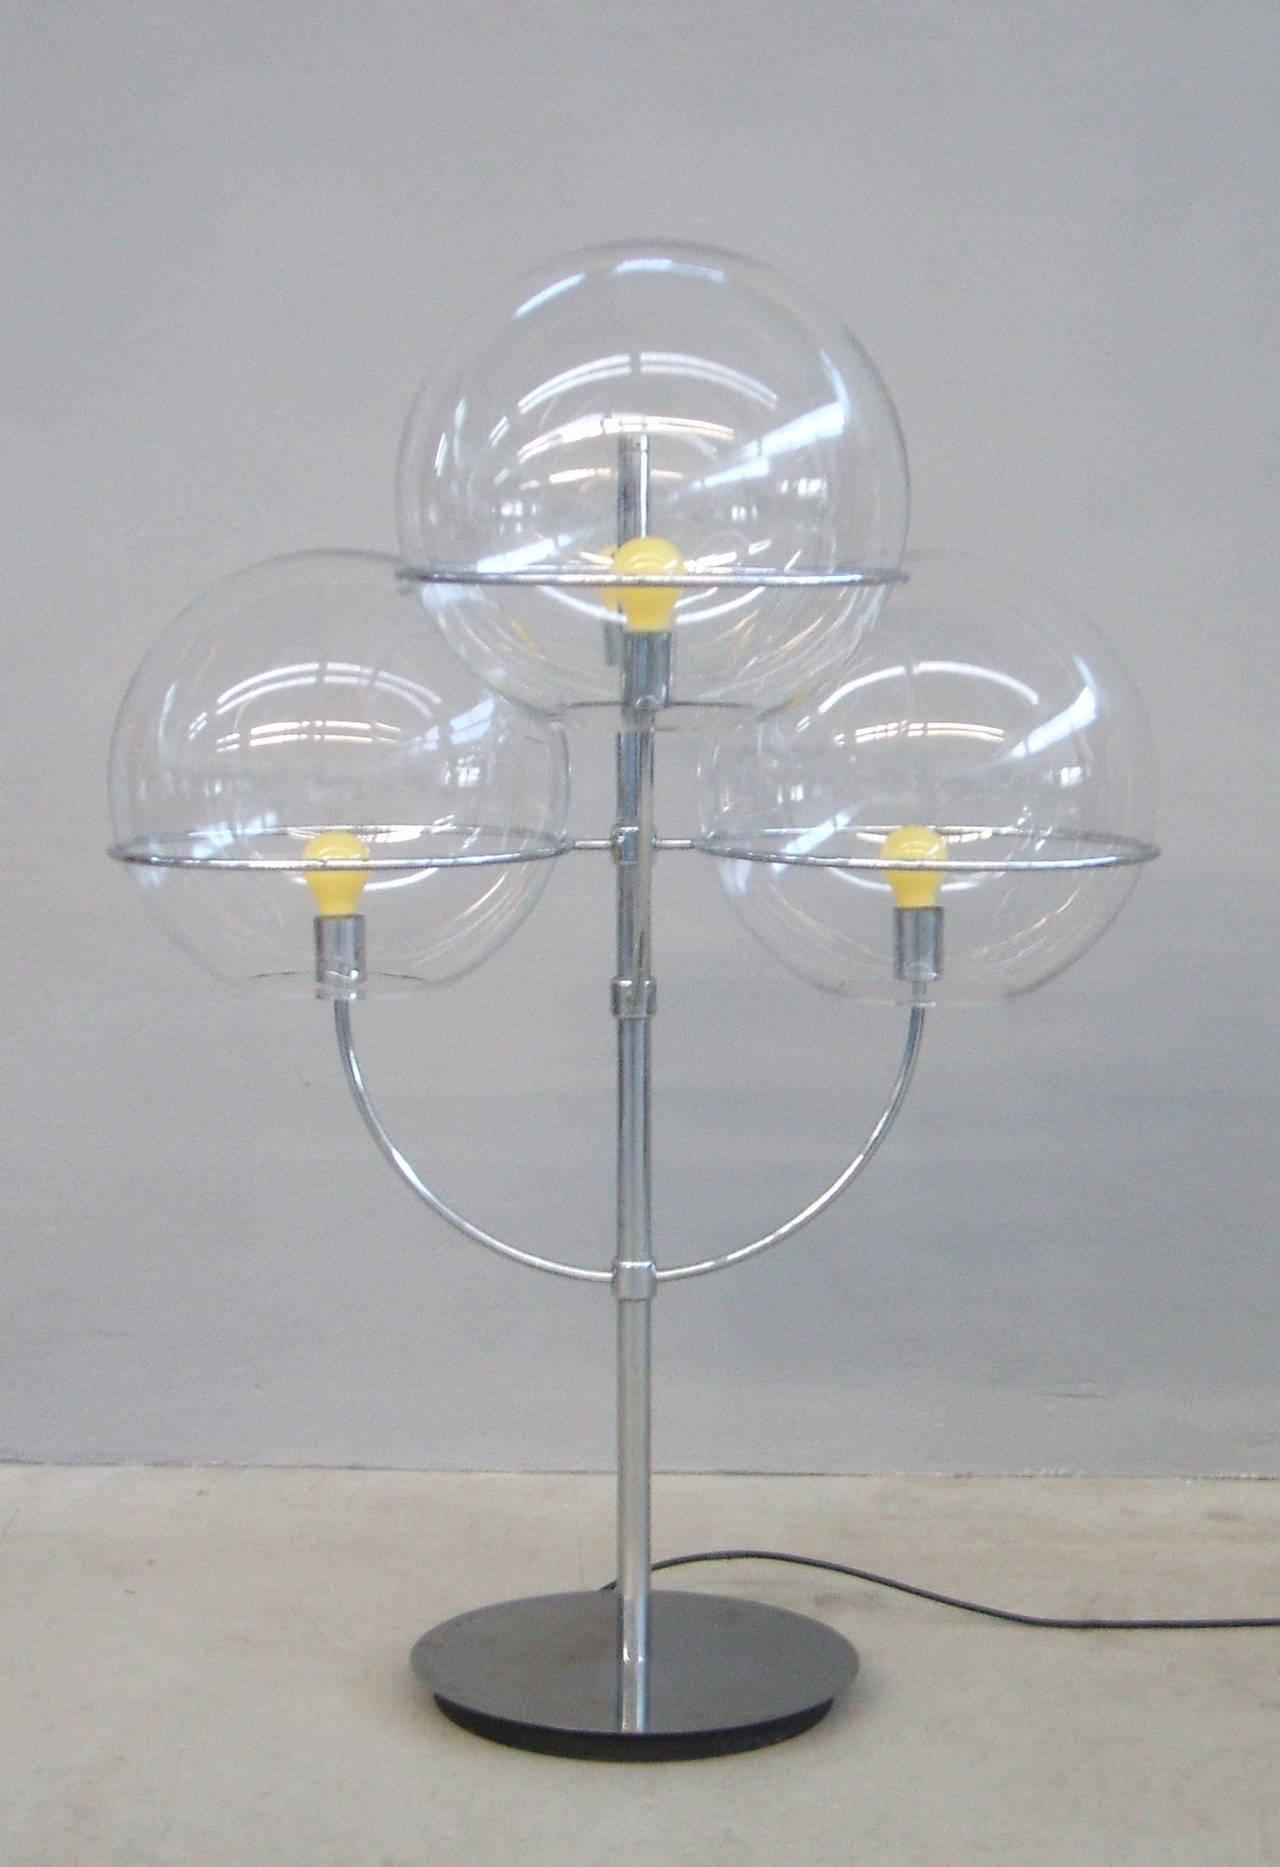 Mod 399 Lindon de sol designed by Vico Magistretti. Chrome steel and four glass reflector. Repertorio 1950-1980 pag. 450.